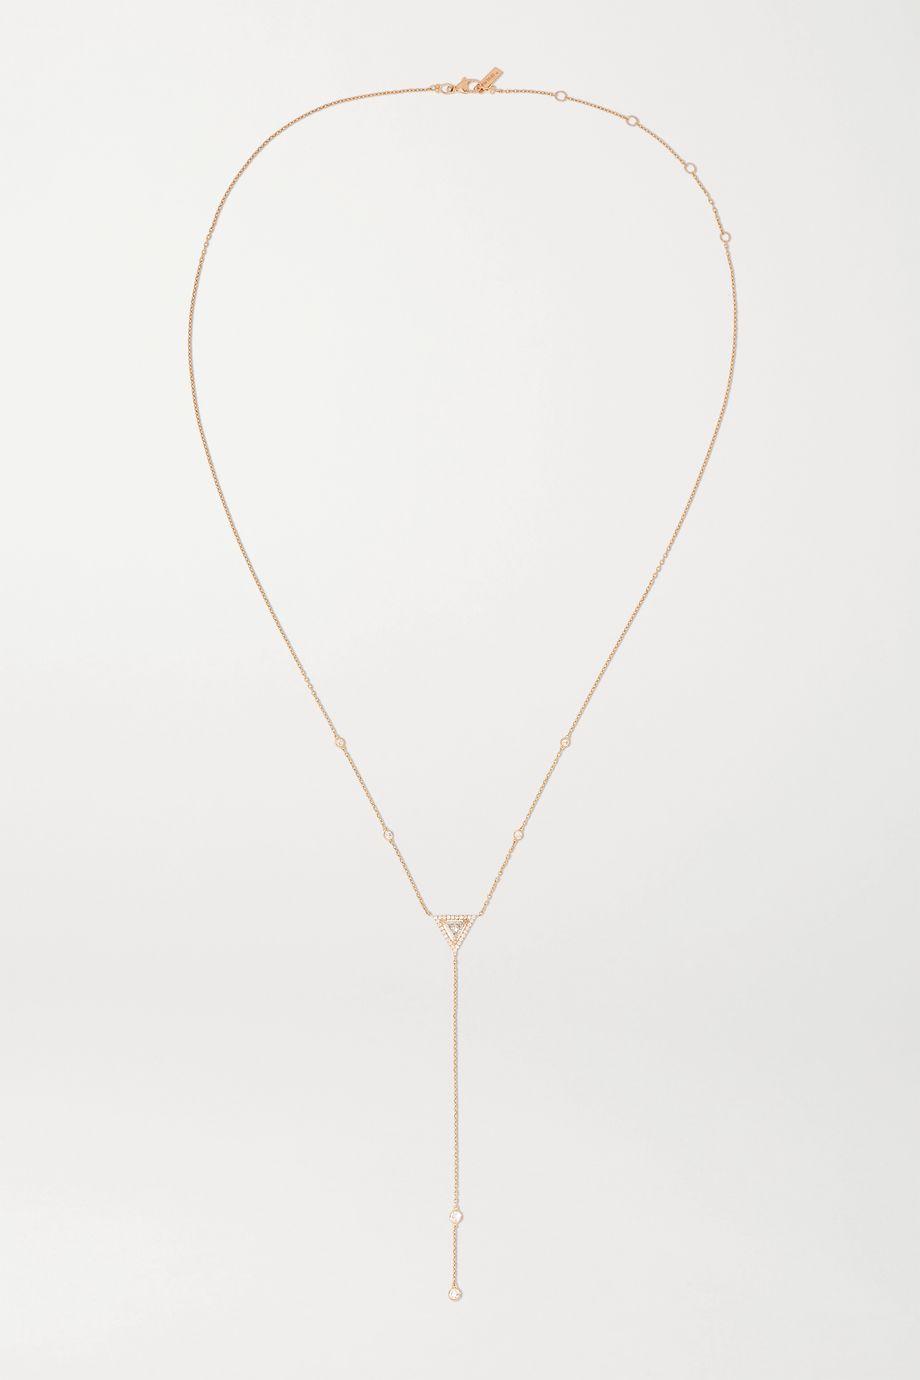 Messika Collier en or rose 18 carats et diamants Théa Long